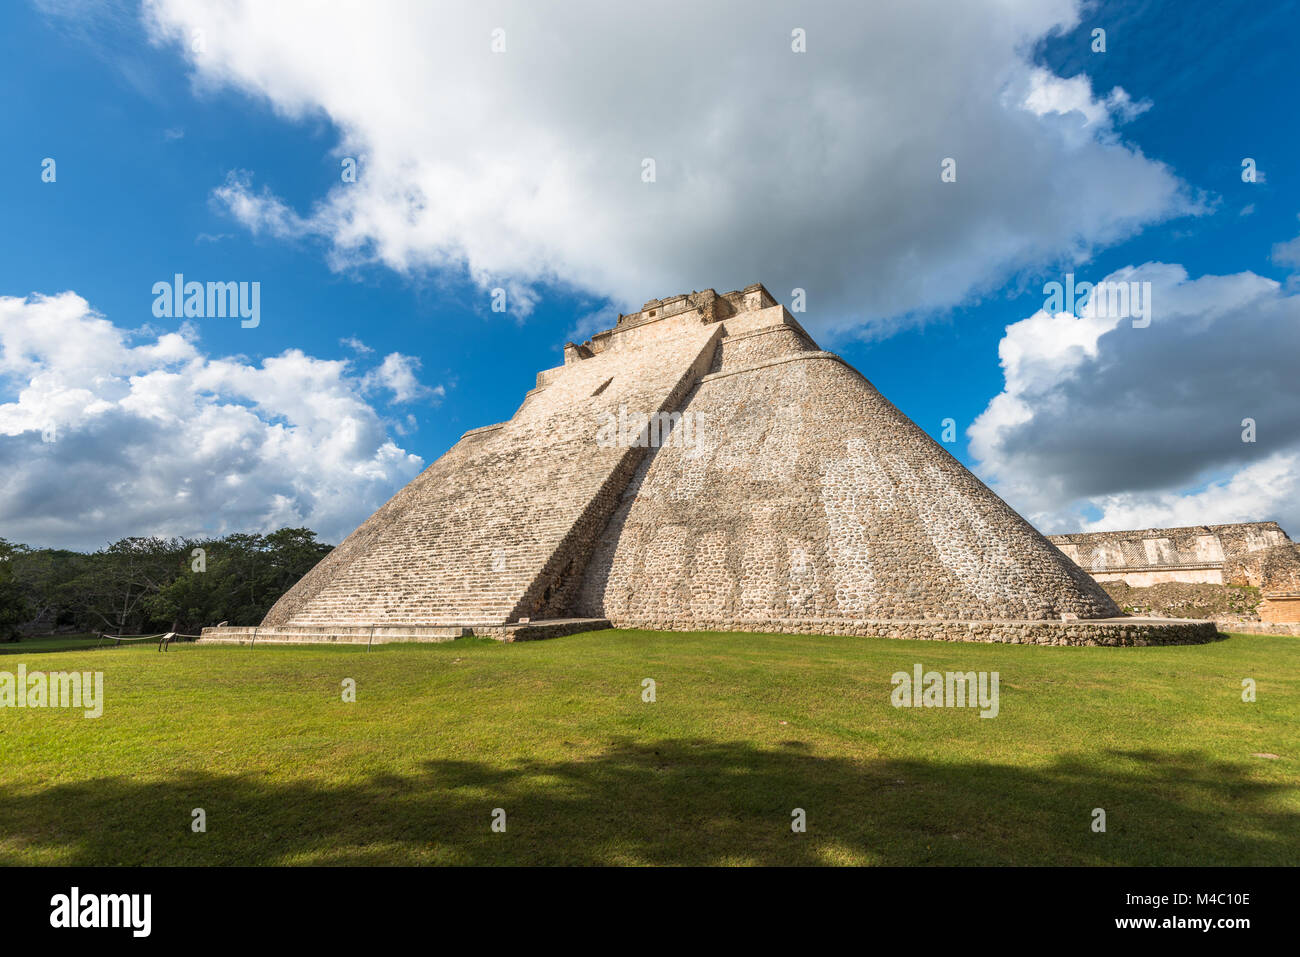 Pyramid of the Magician in Uxmal, Yucatan, Mexico Stock Photo